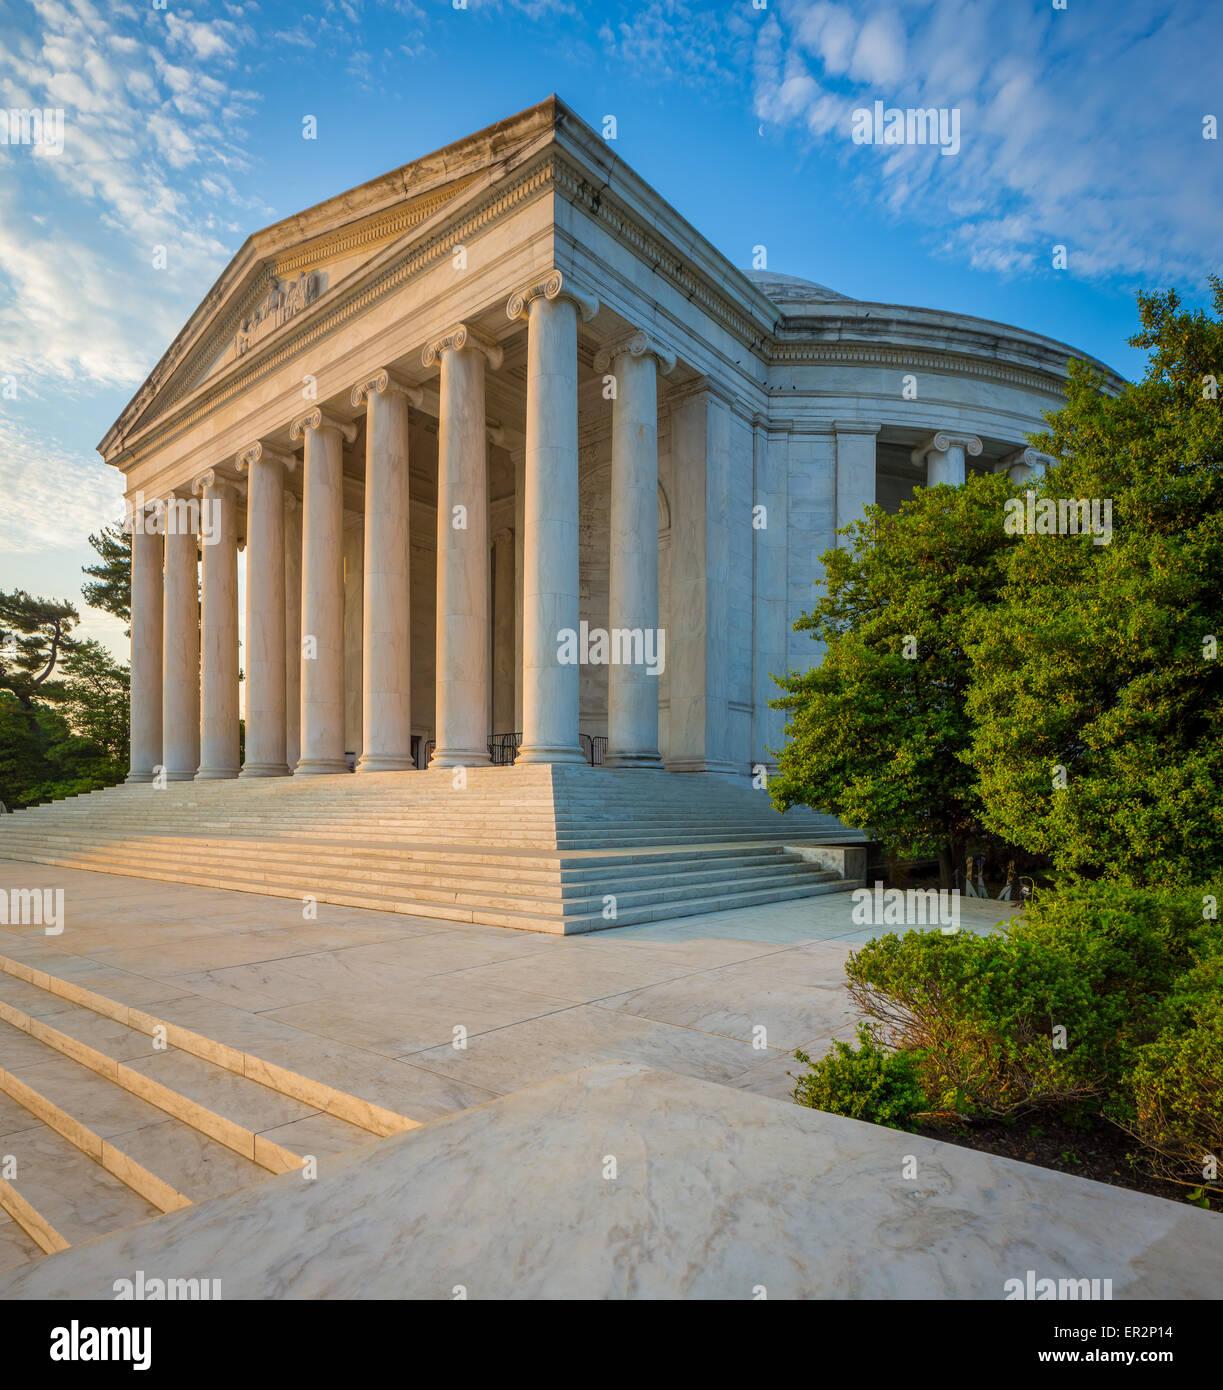 Thomas Jefferson Memorial ist ein presidential Memorial in Washington, D.C. Stockbild